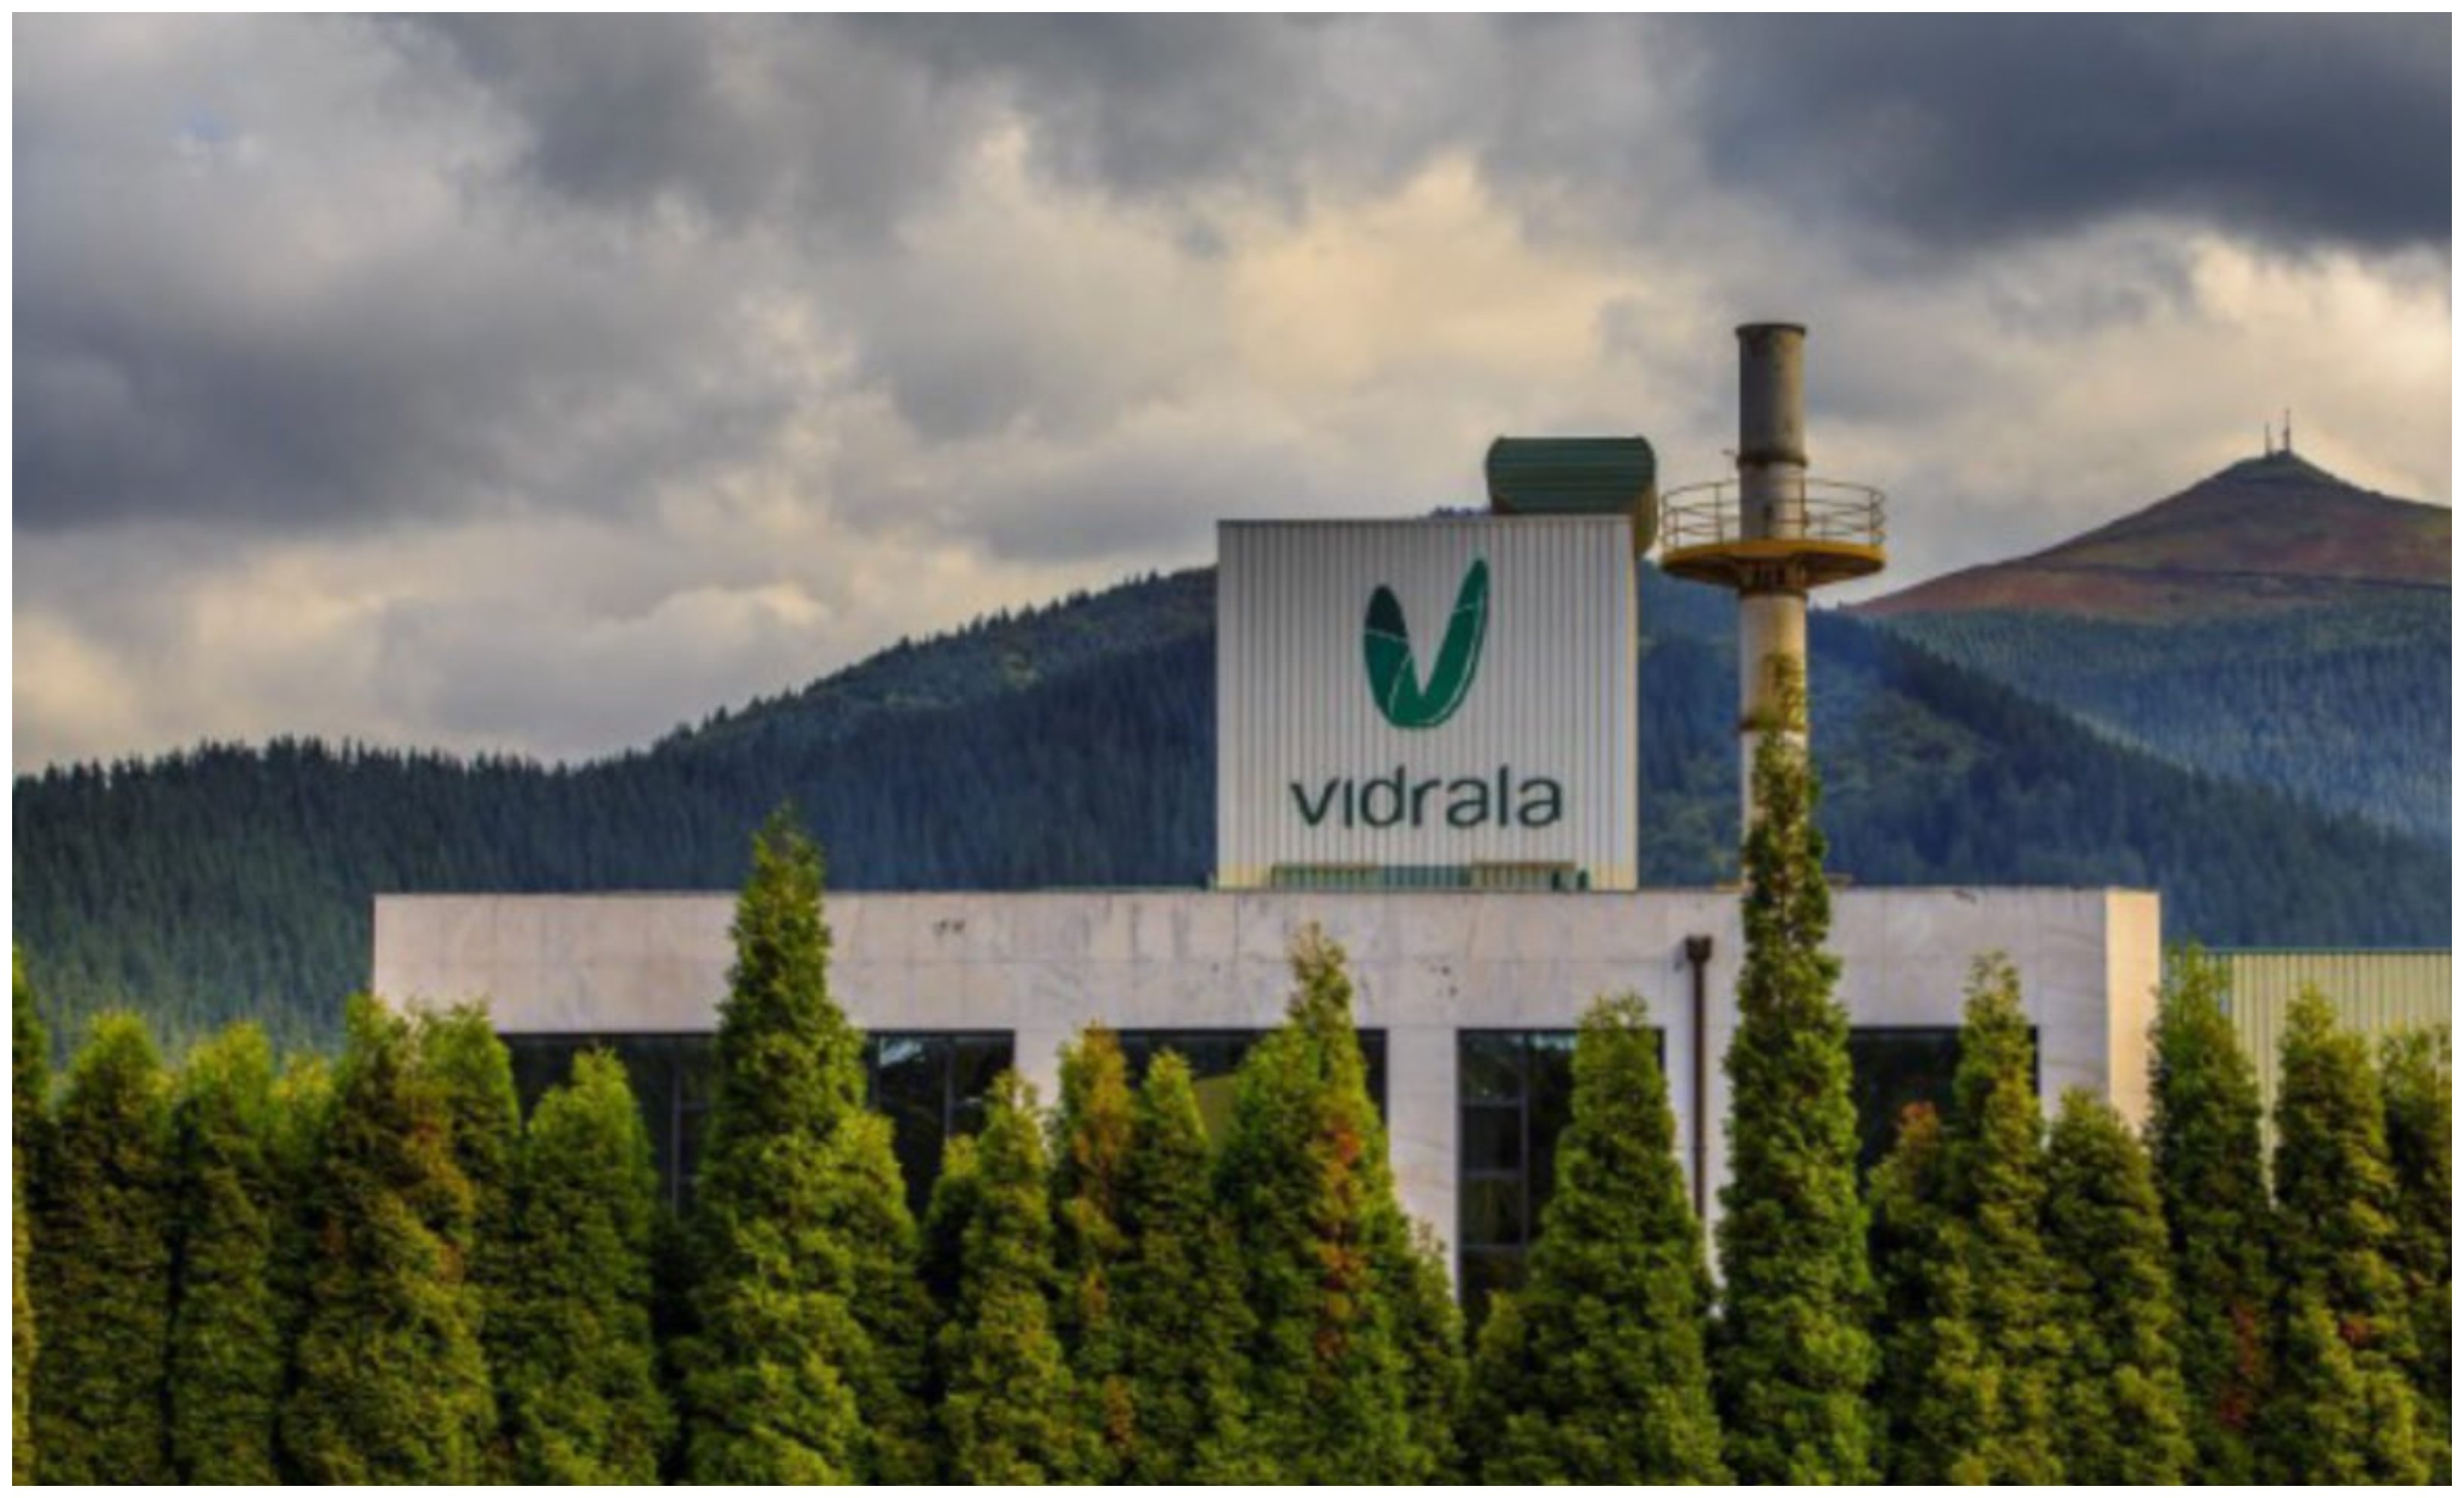 Vidrala ganó 143 millones de euros en 2019, un 24% más